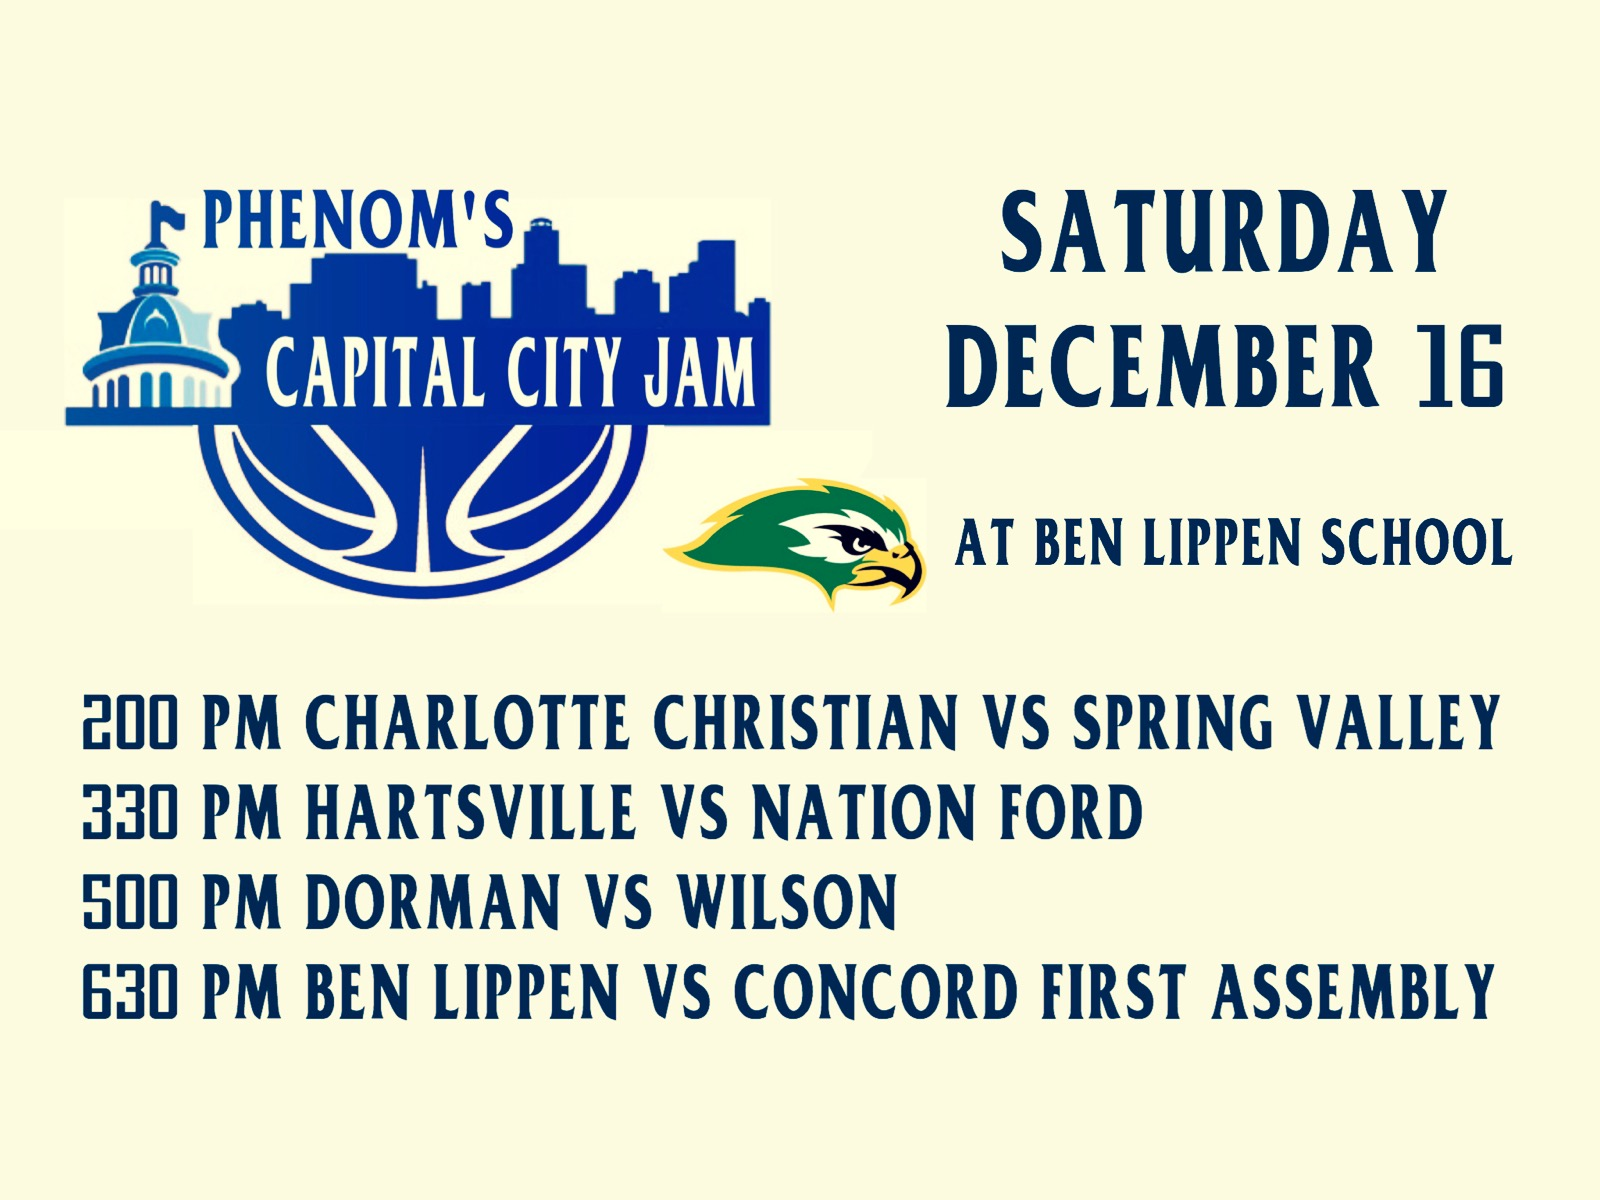 Ben Lippen Basketball to Host Phenom's Capital City Jam on Saturday, Dec 16